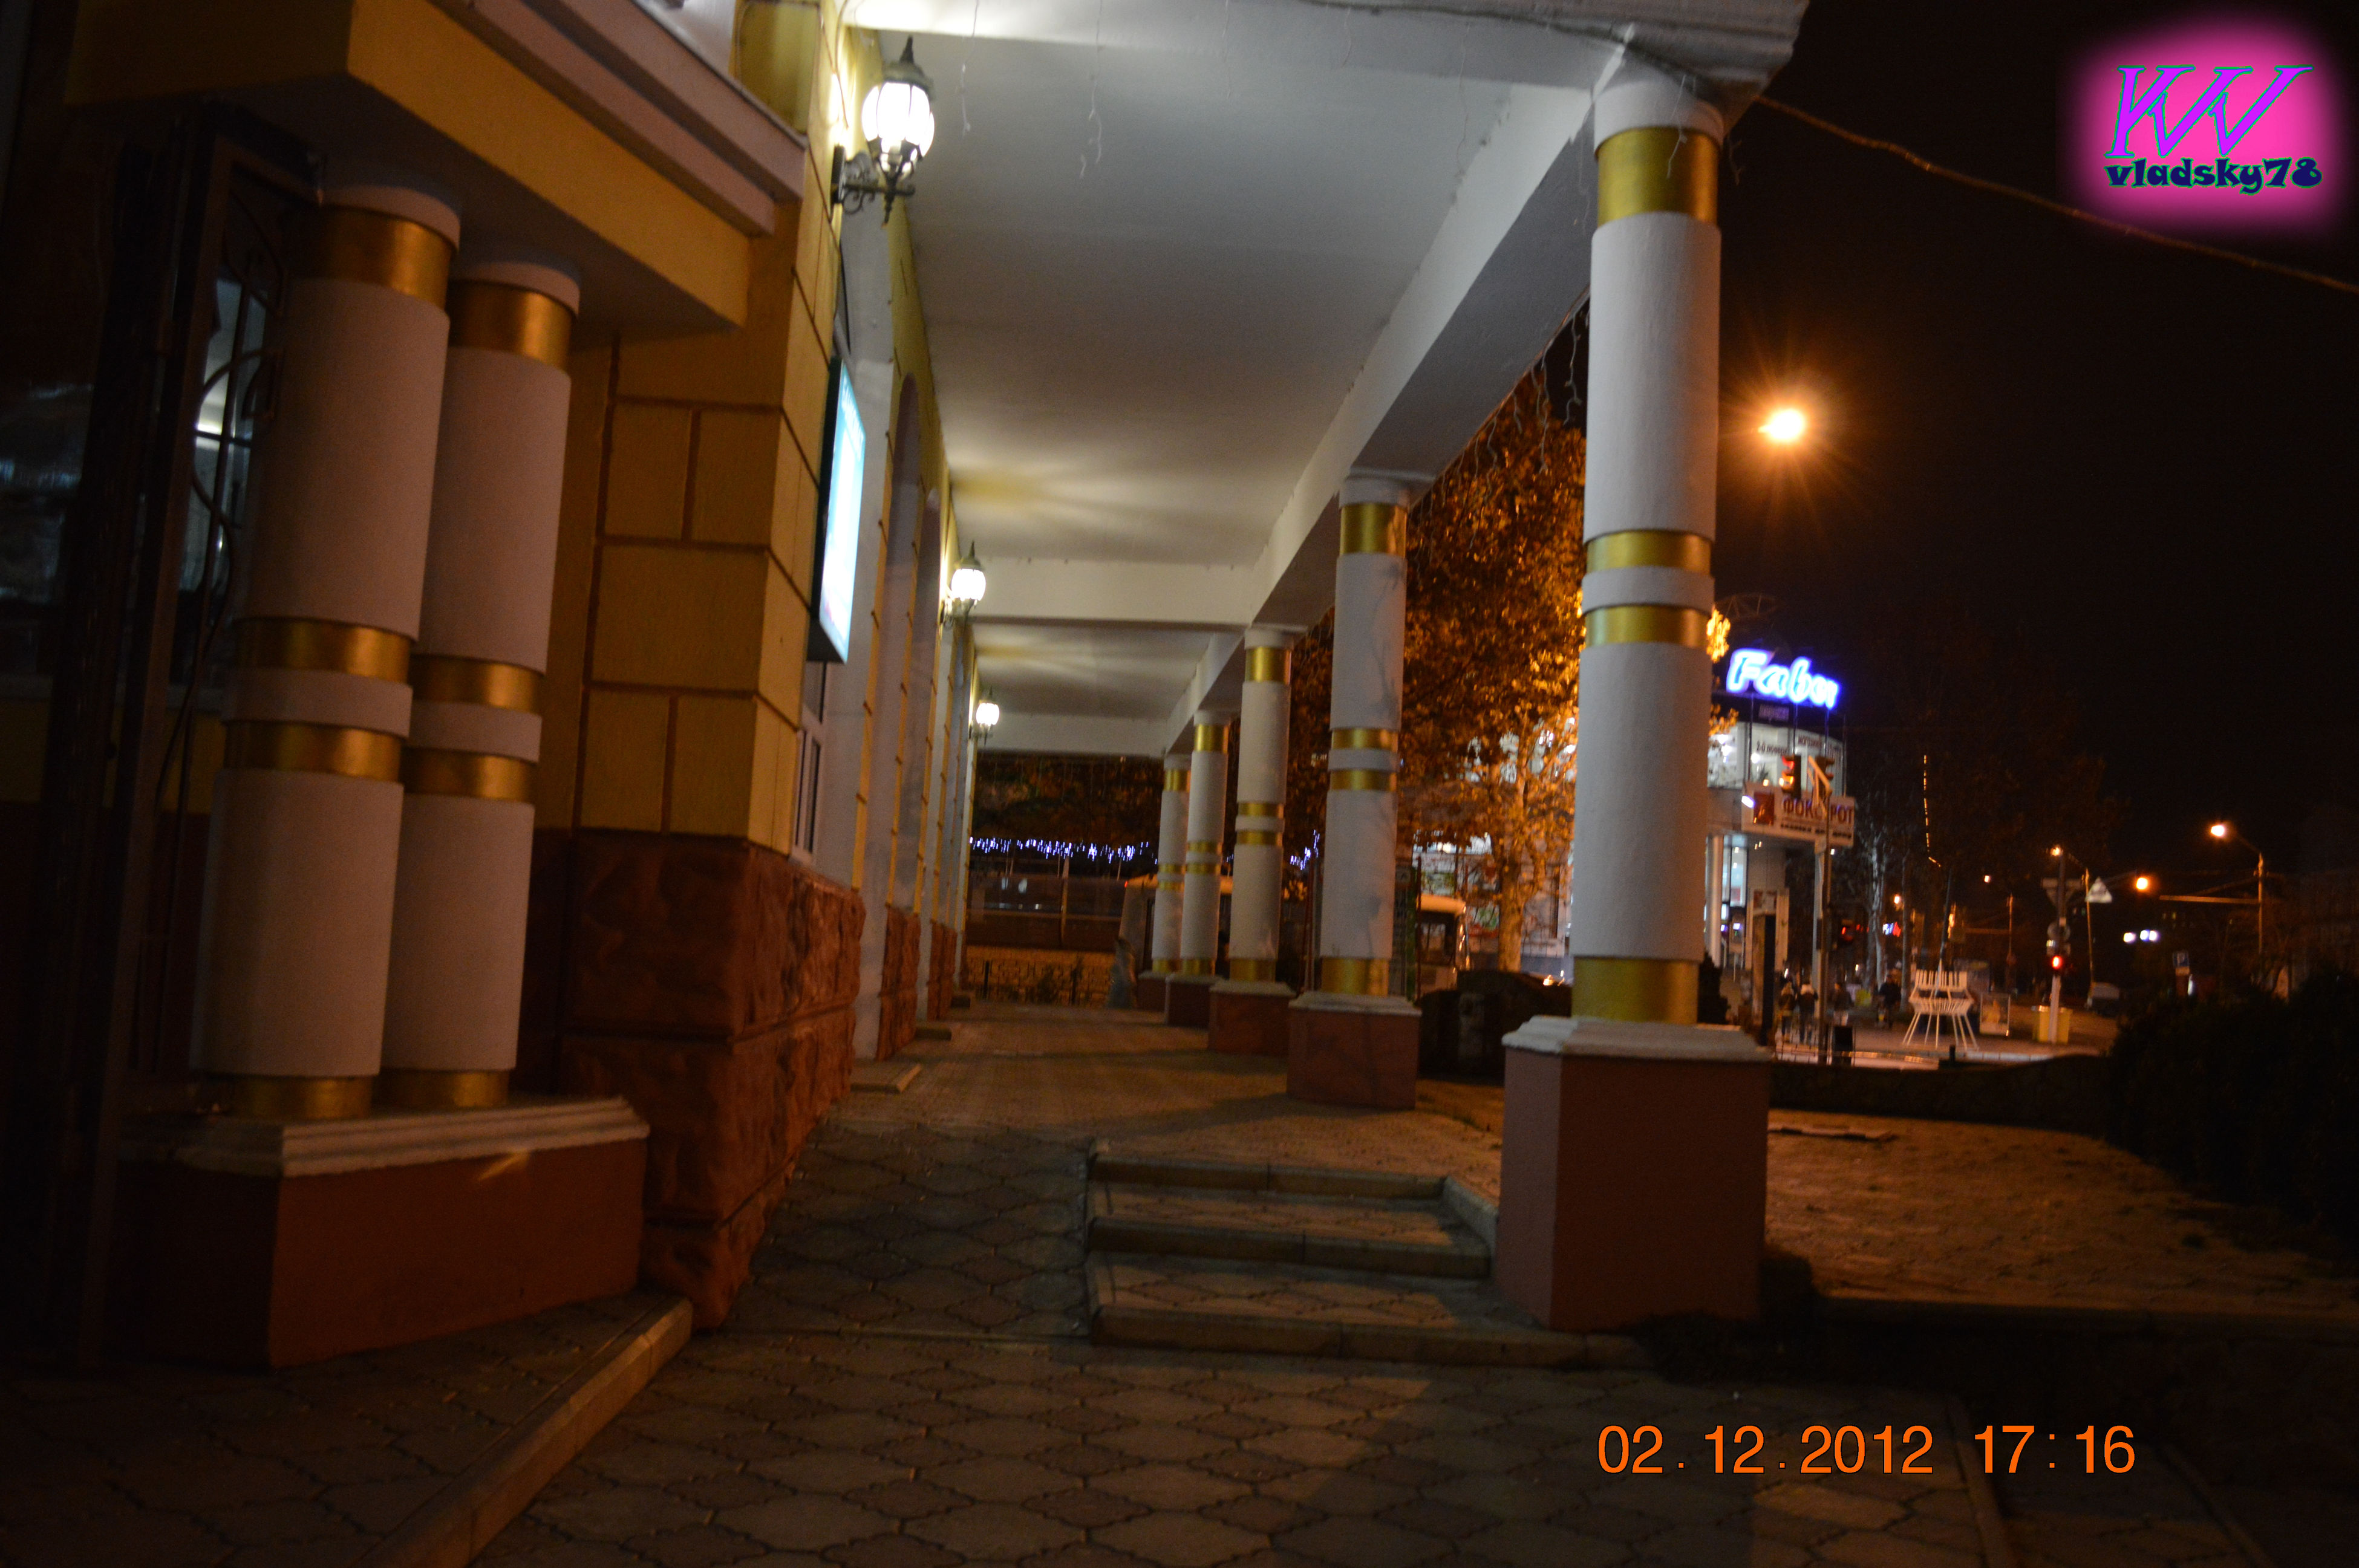 illuminated, city, night, architecture, no people, outdoors